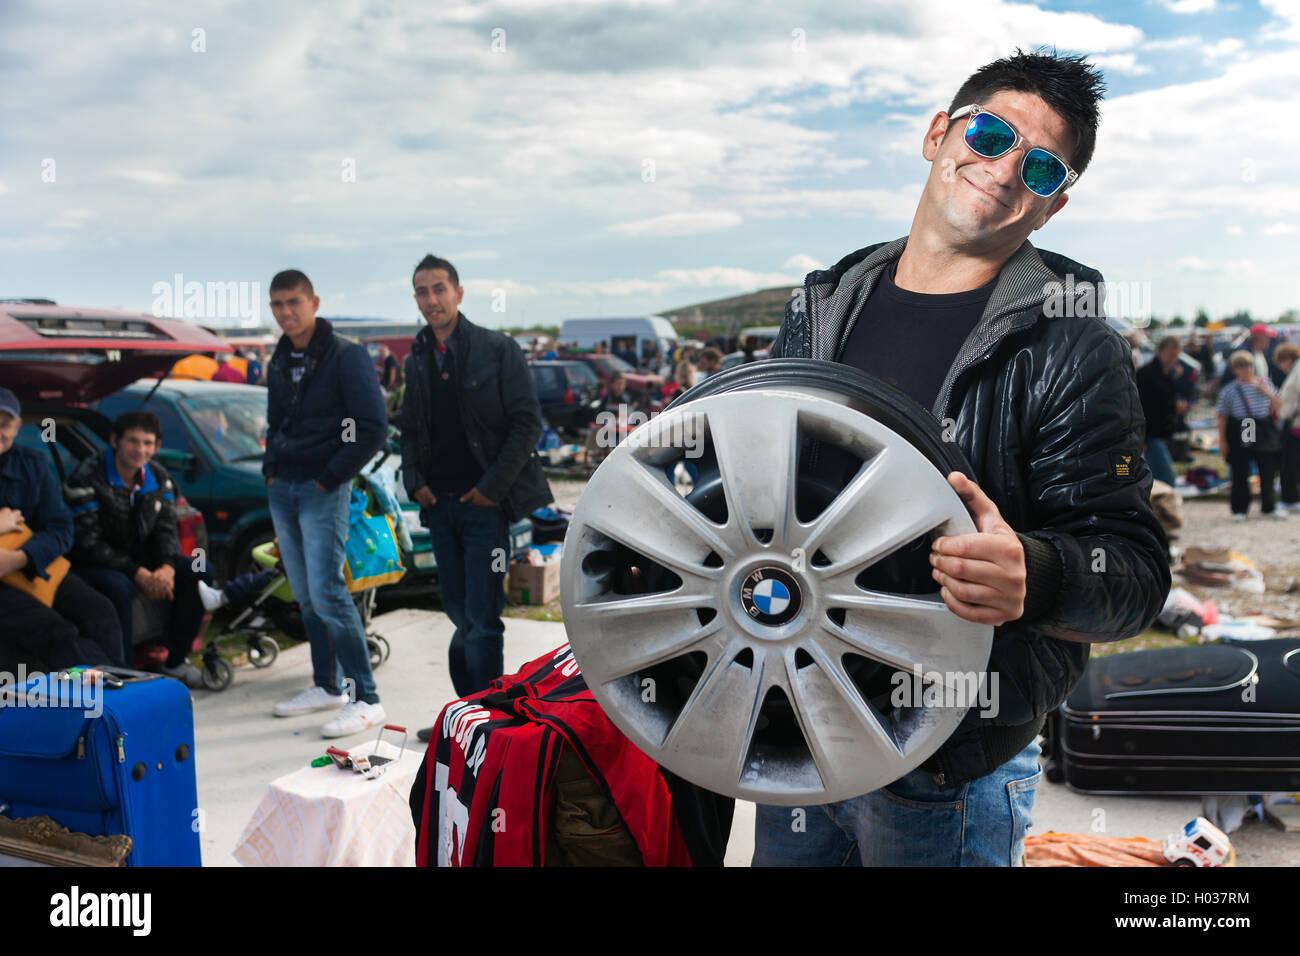 ZAGREB, CROATIA - OCTOBER 20, 2013: Roma salesman holding used car rim at Zagreb's flea market Hrelic. - Stock Image